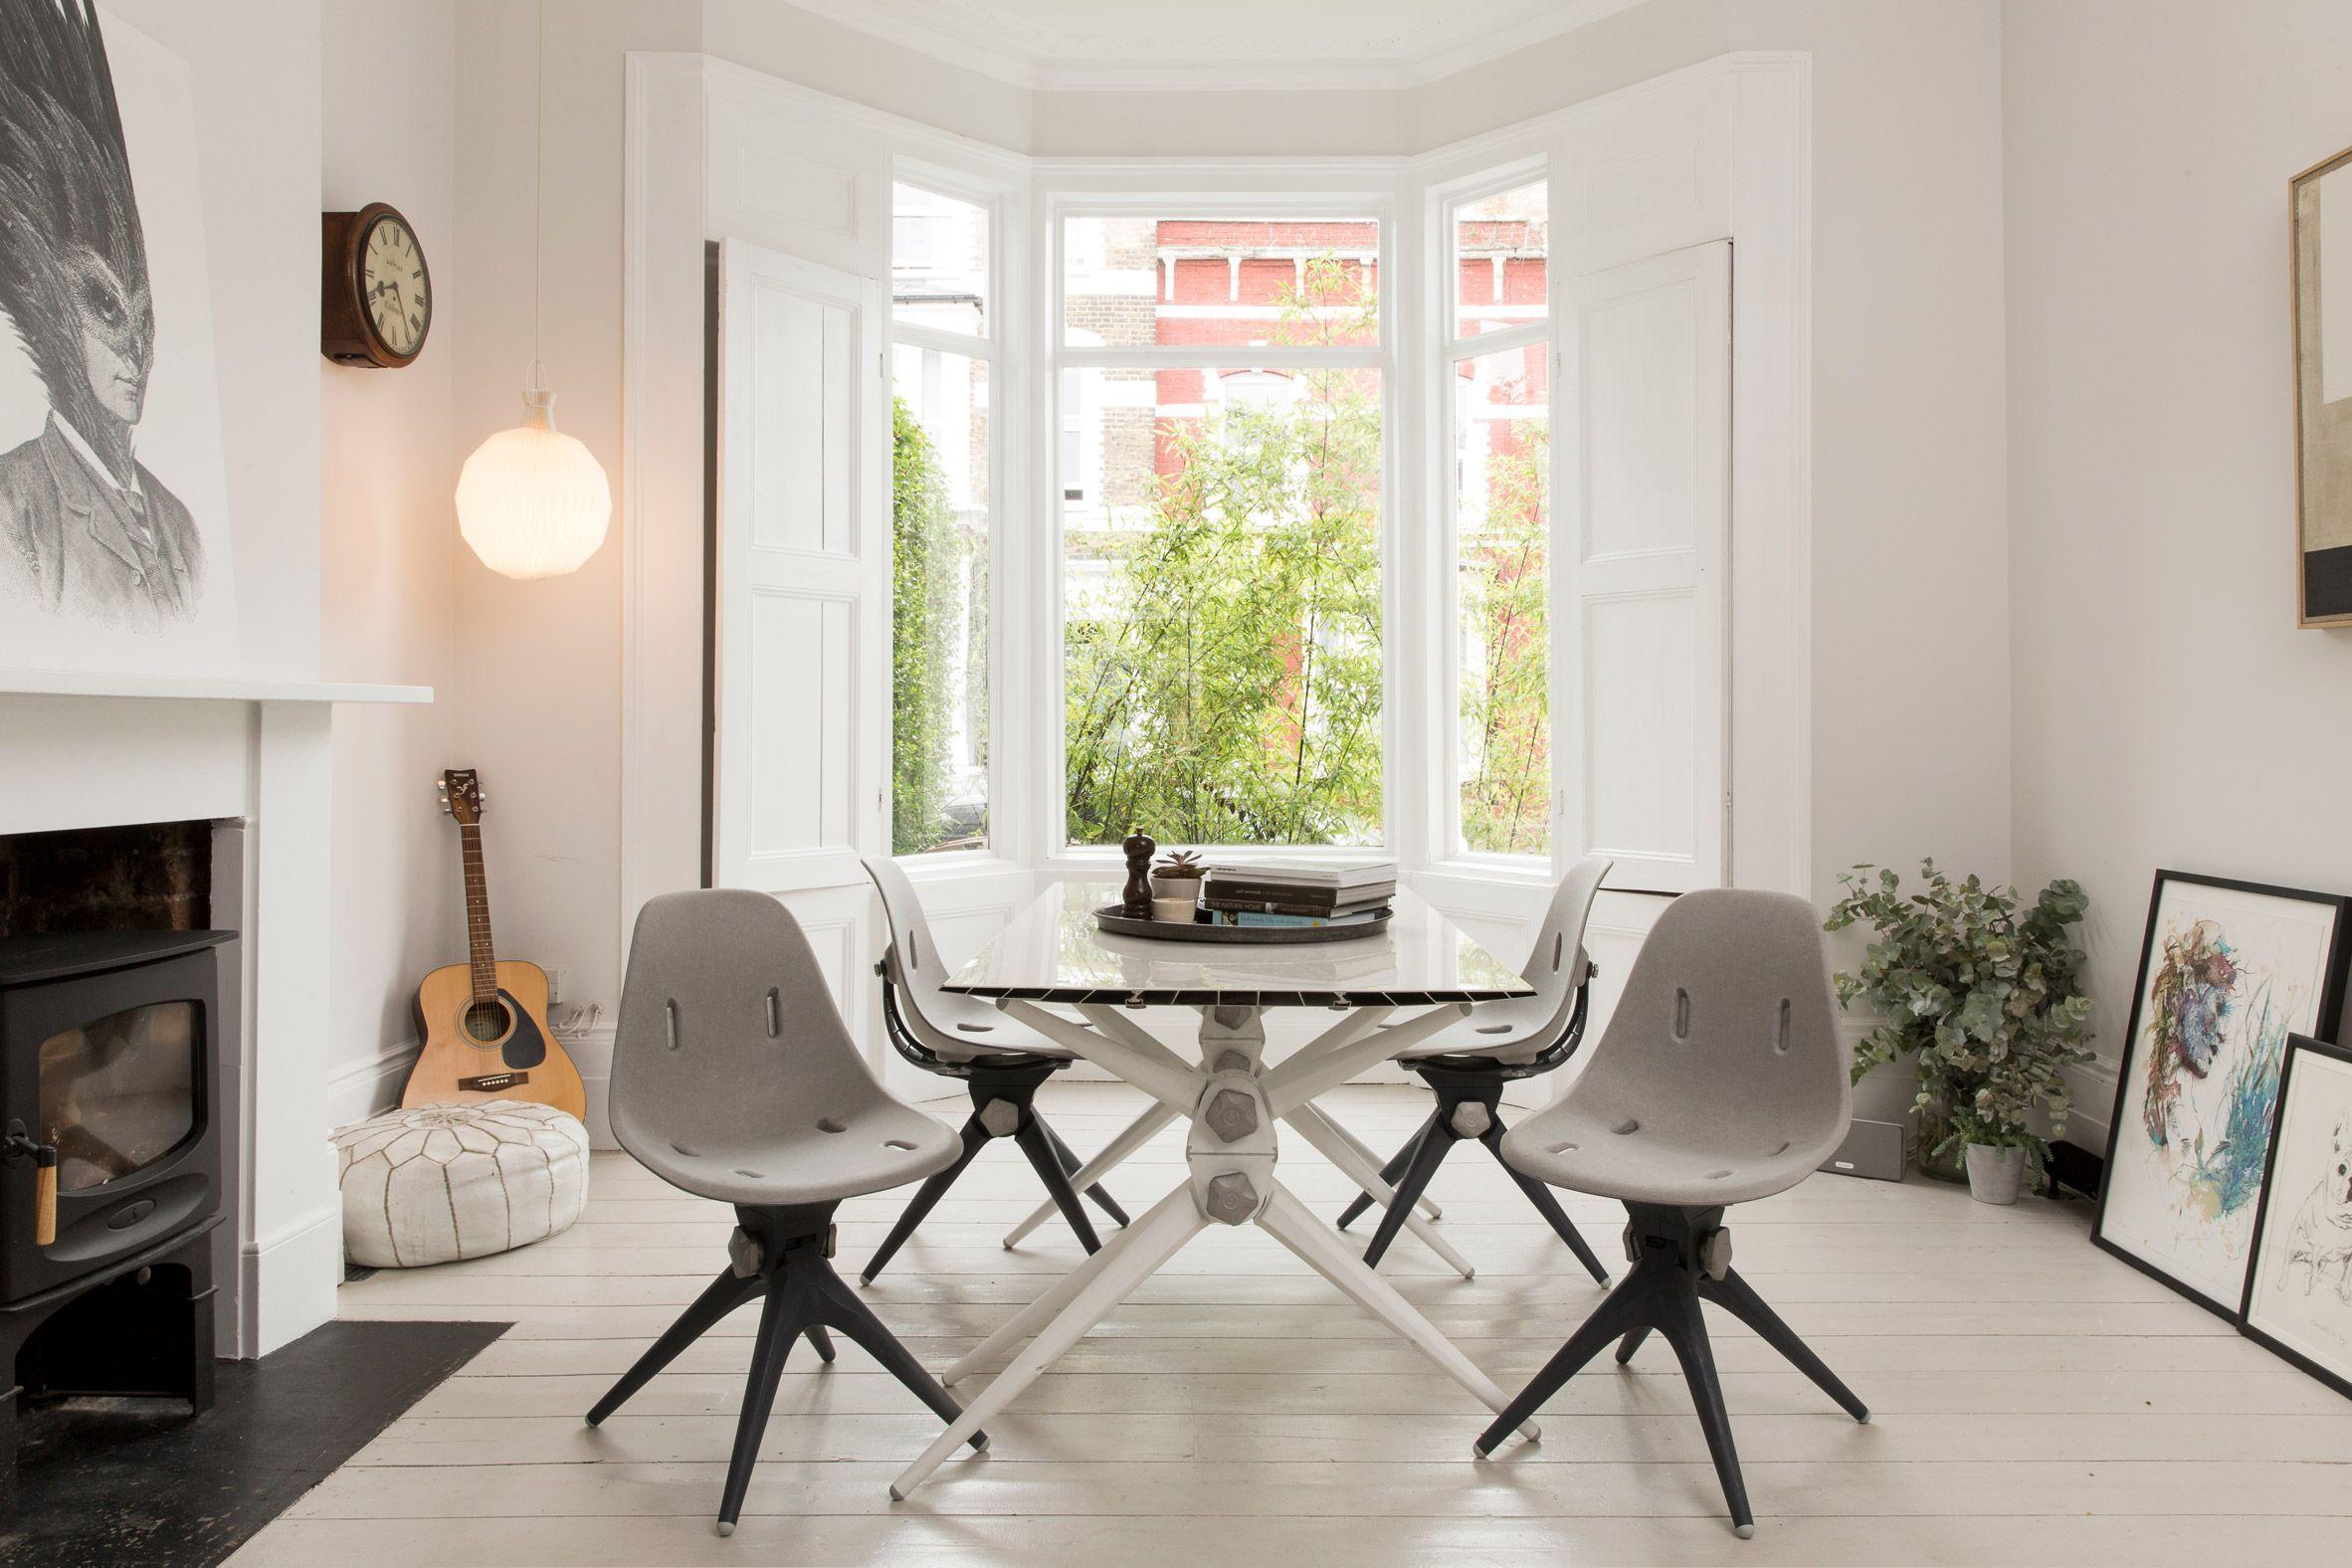 Espacio de salón comedor con mobiliario sostenible de la firma Pentatonic, tendencia en diseño e interiorismo 2020 @Utrillanais